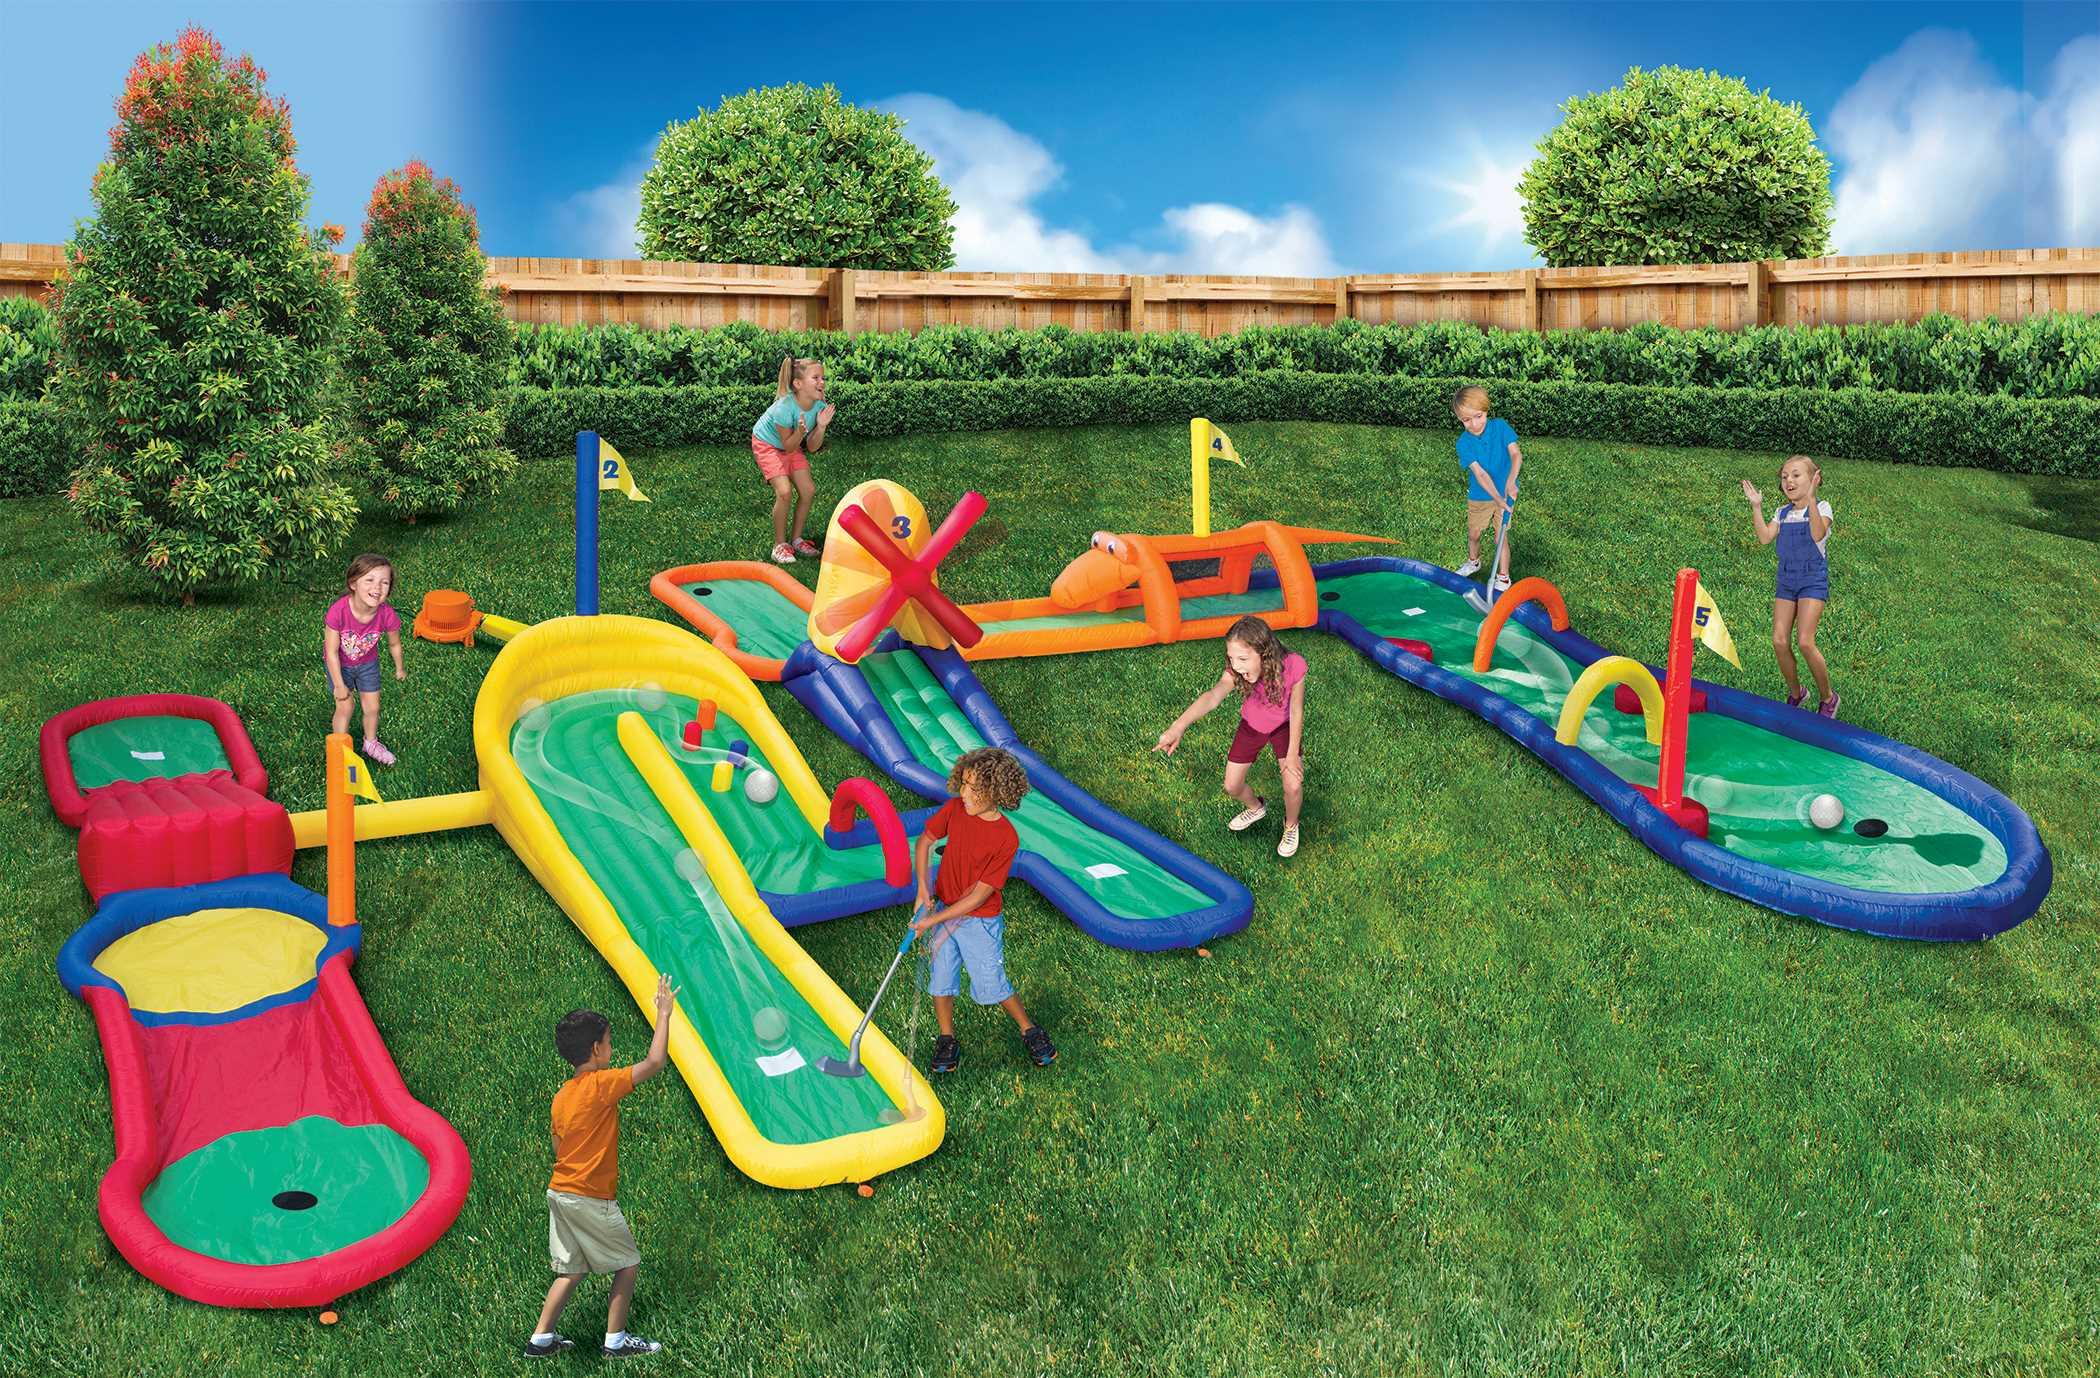 Banzai Inflatable 5 Hole Mini Golf Course Backyard ...